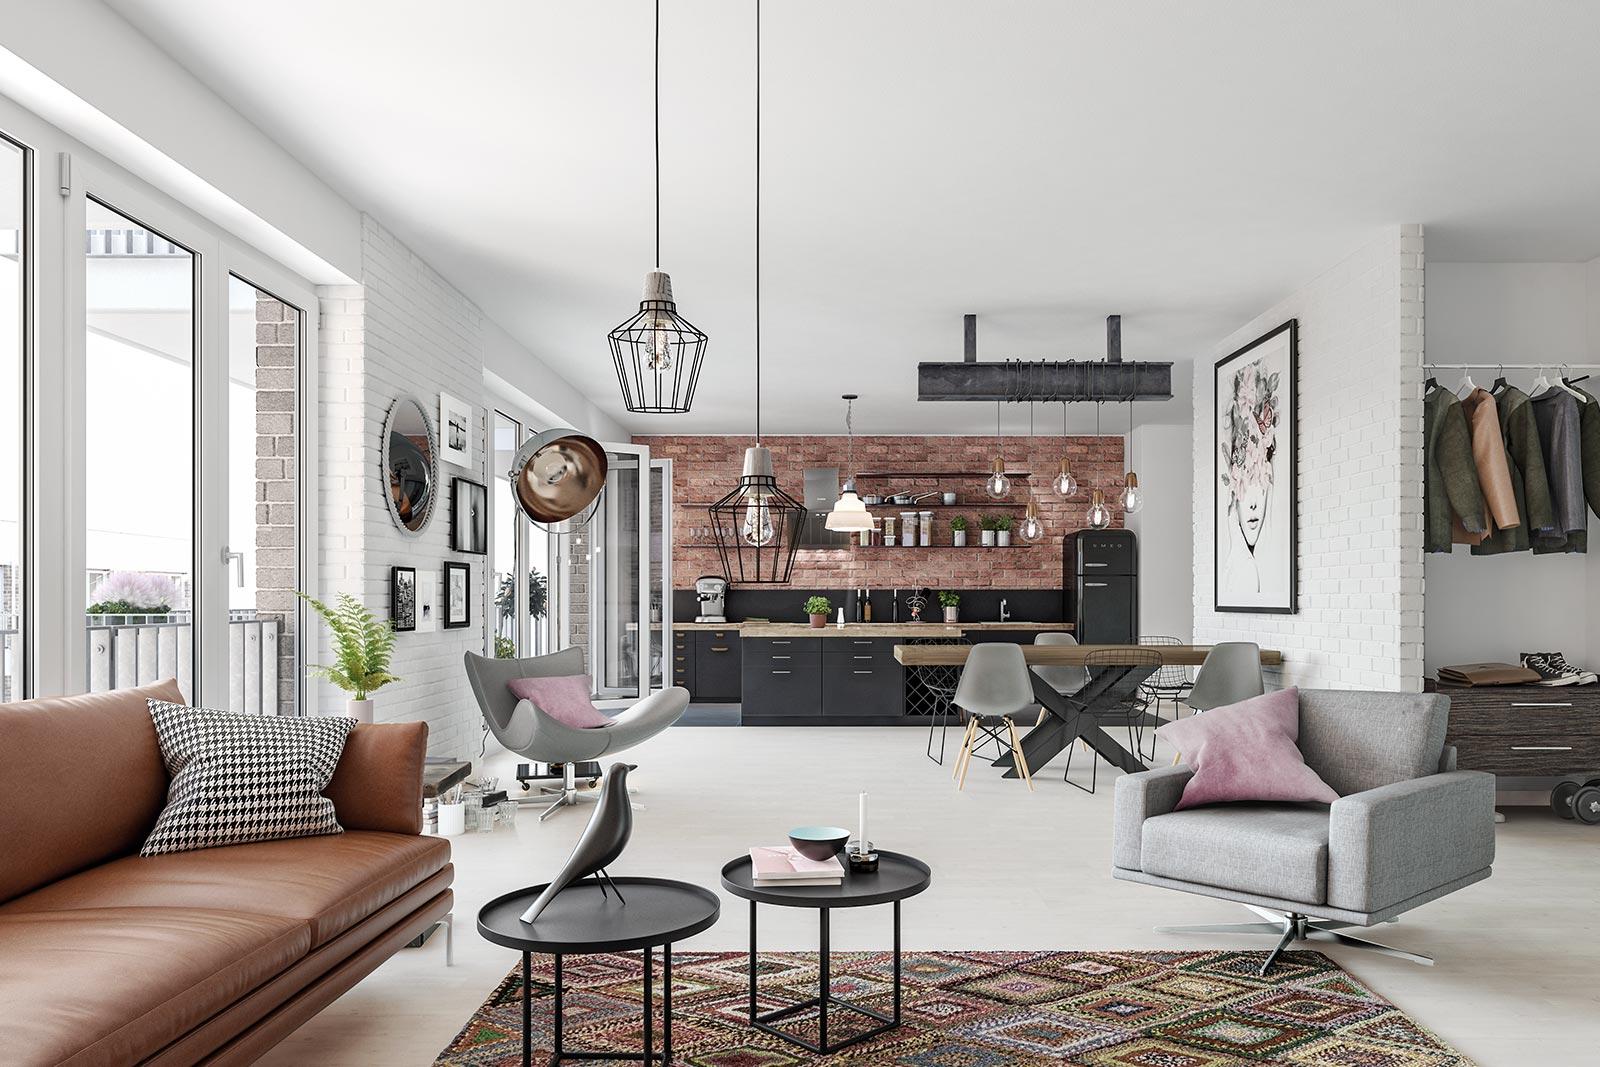 lifestyle project immobilien n rnberg galerie. Black Bedroom Furniture Sets. Home Design Ideas